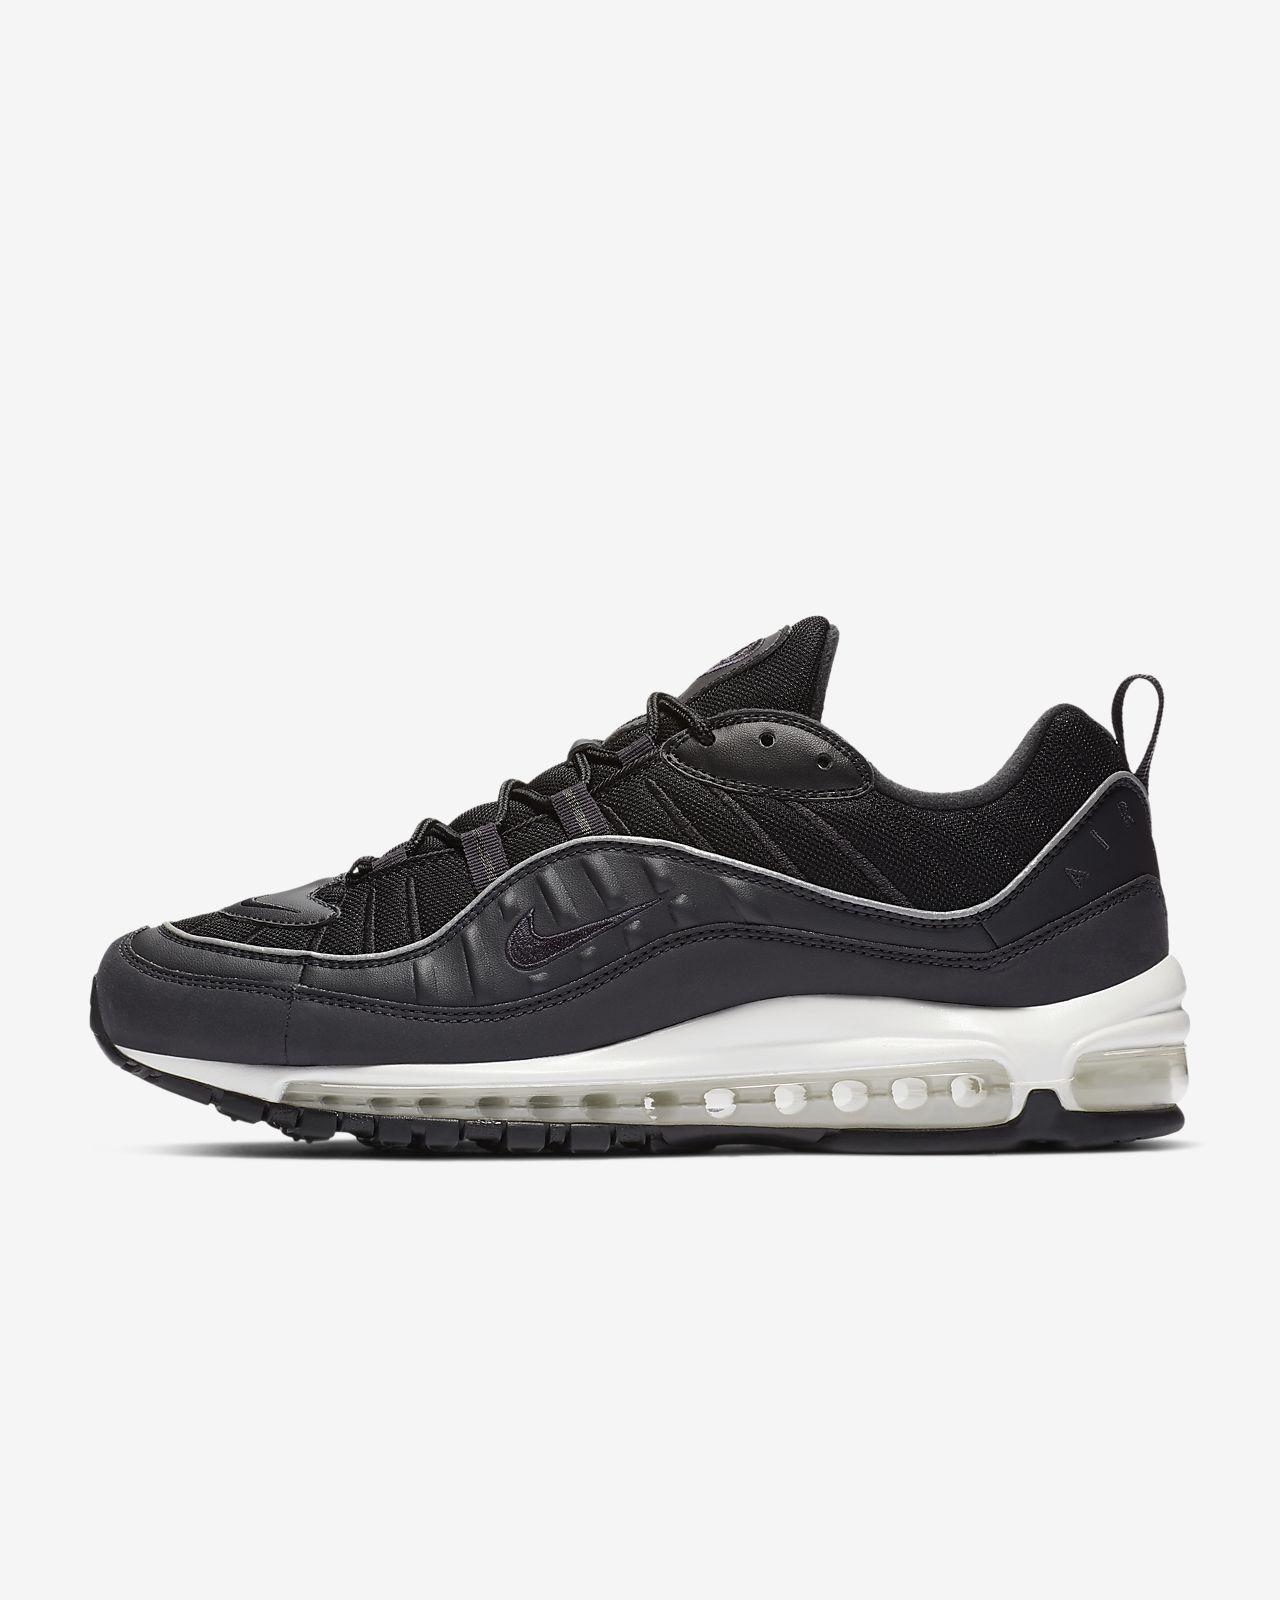 sneakers for cheap 07d87 cbb84 ... Nike Air Max 98 Zapatillas - Hombre